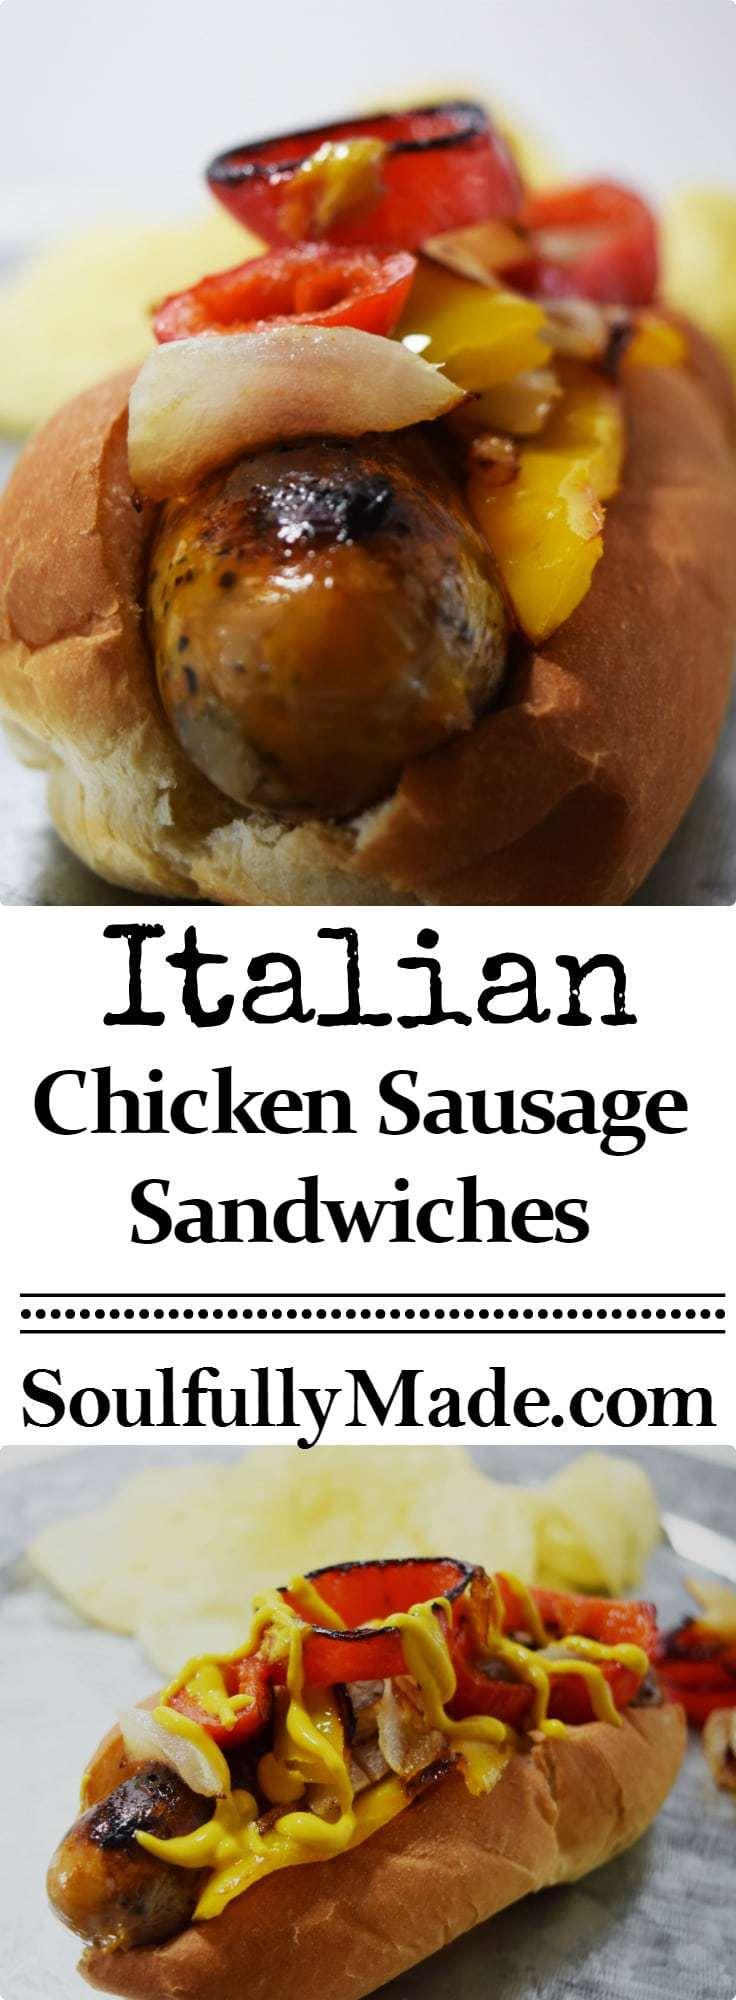 Italian Chicken Sausage Sandwich Pin